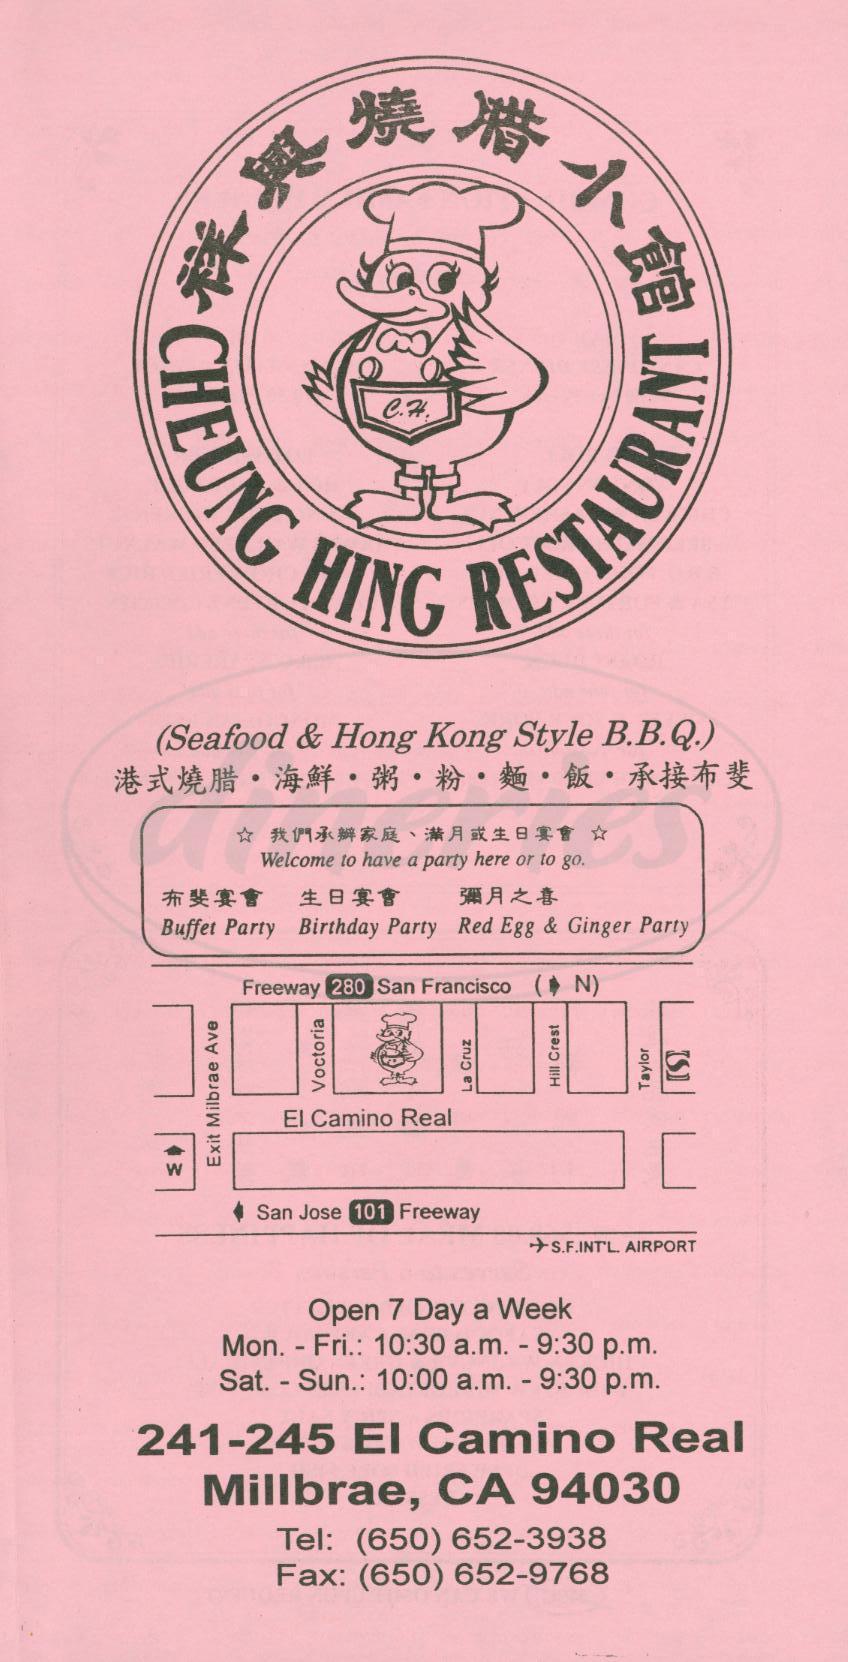 menu for Cheung Hing Restaurant